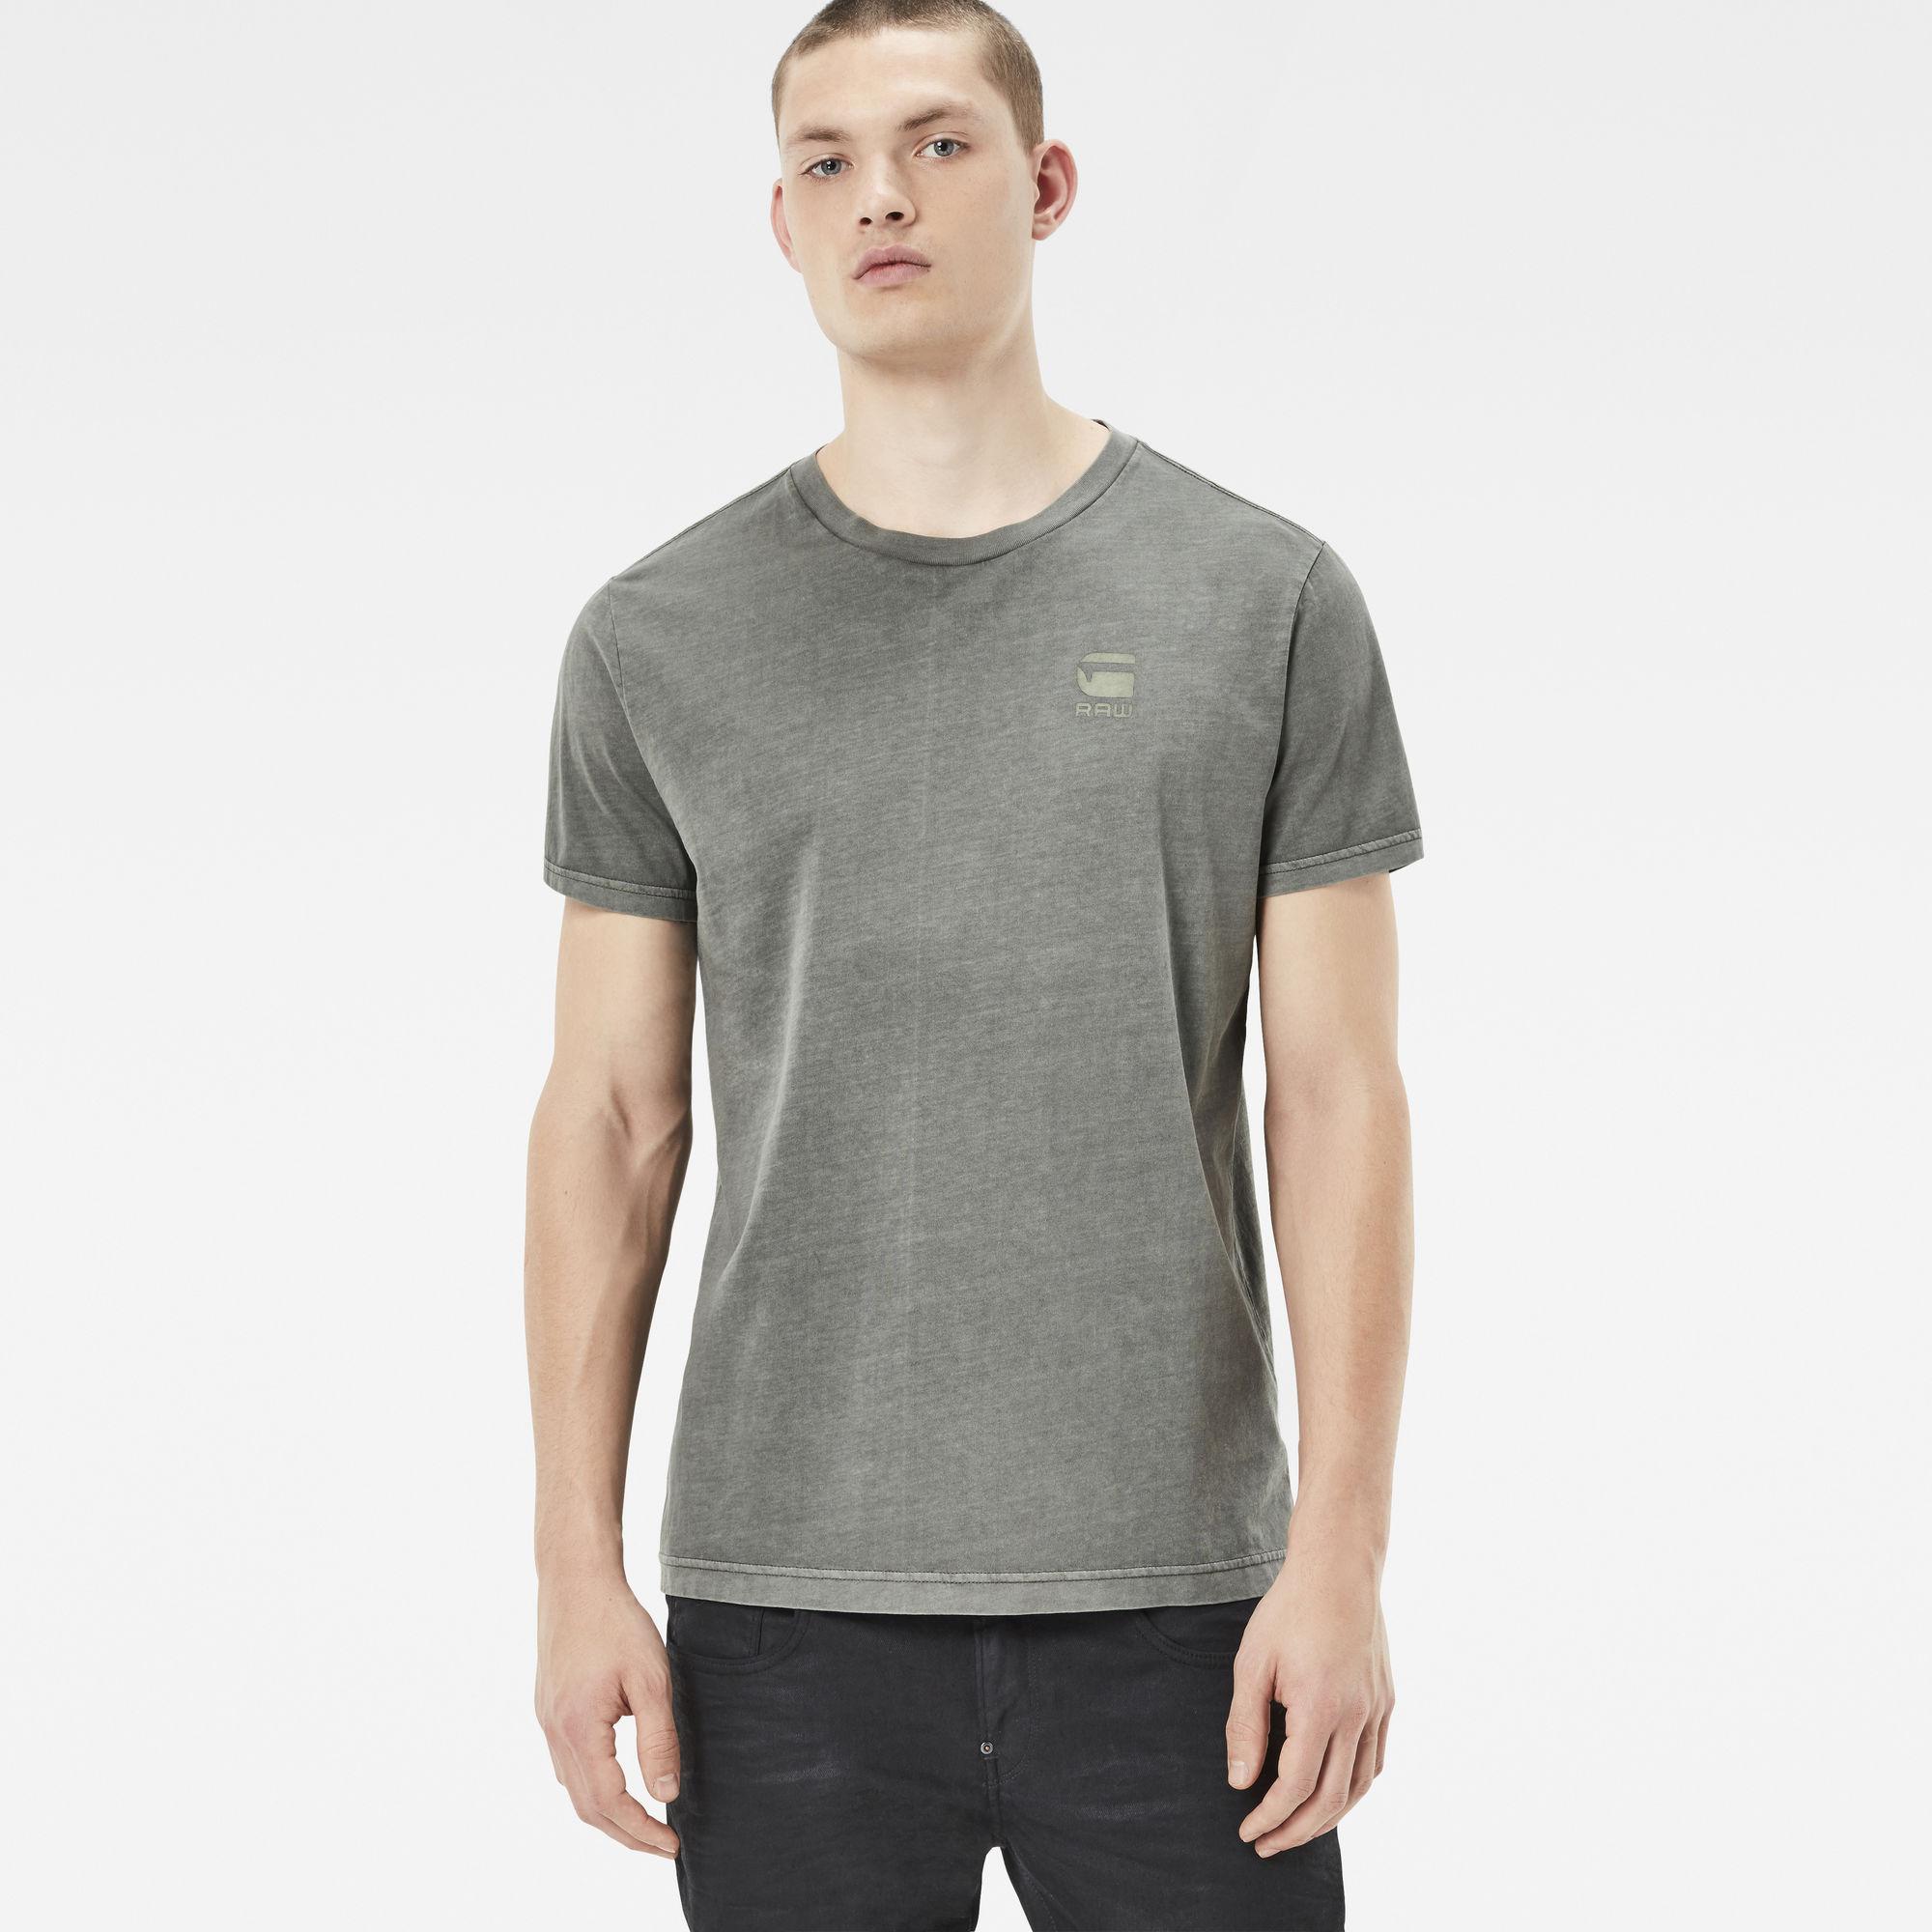 Image of G Star Raw Abram T-Shirt